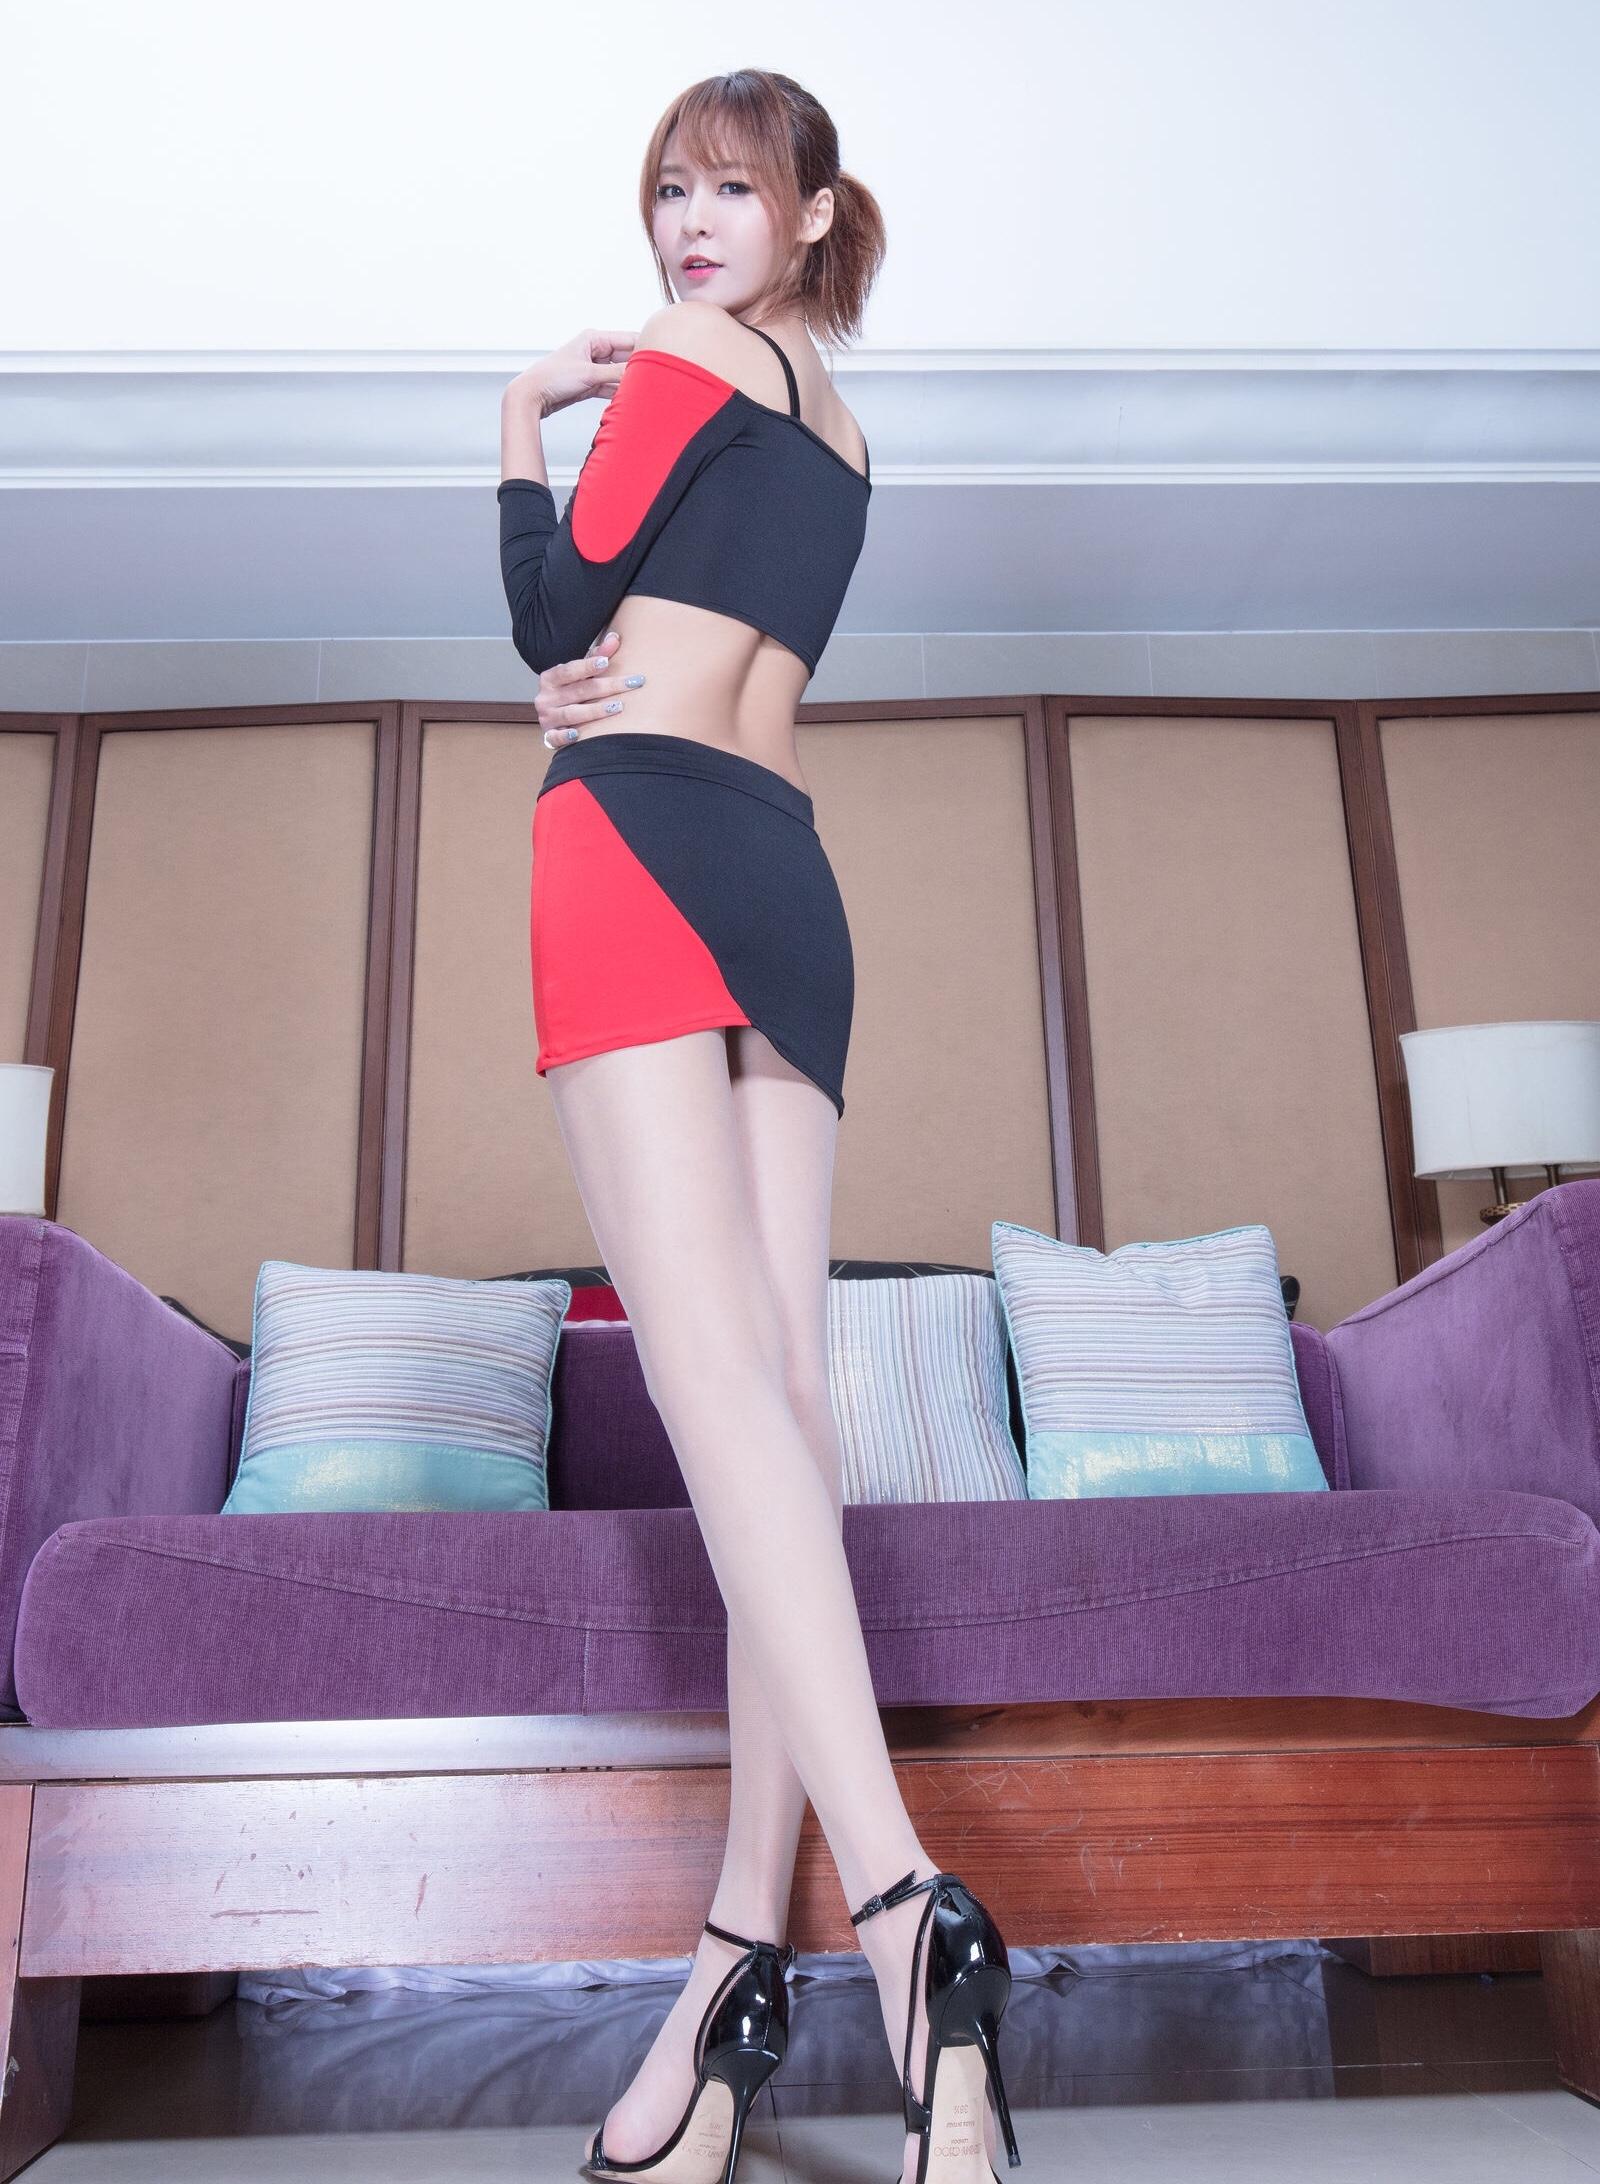 beautyleg model winnie racing model cosplay 13